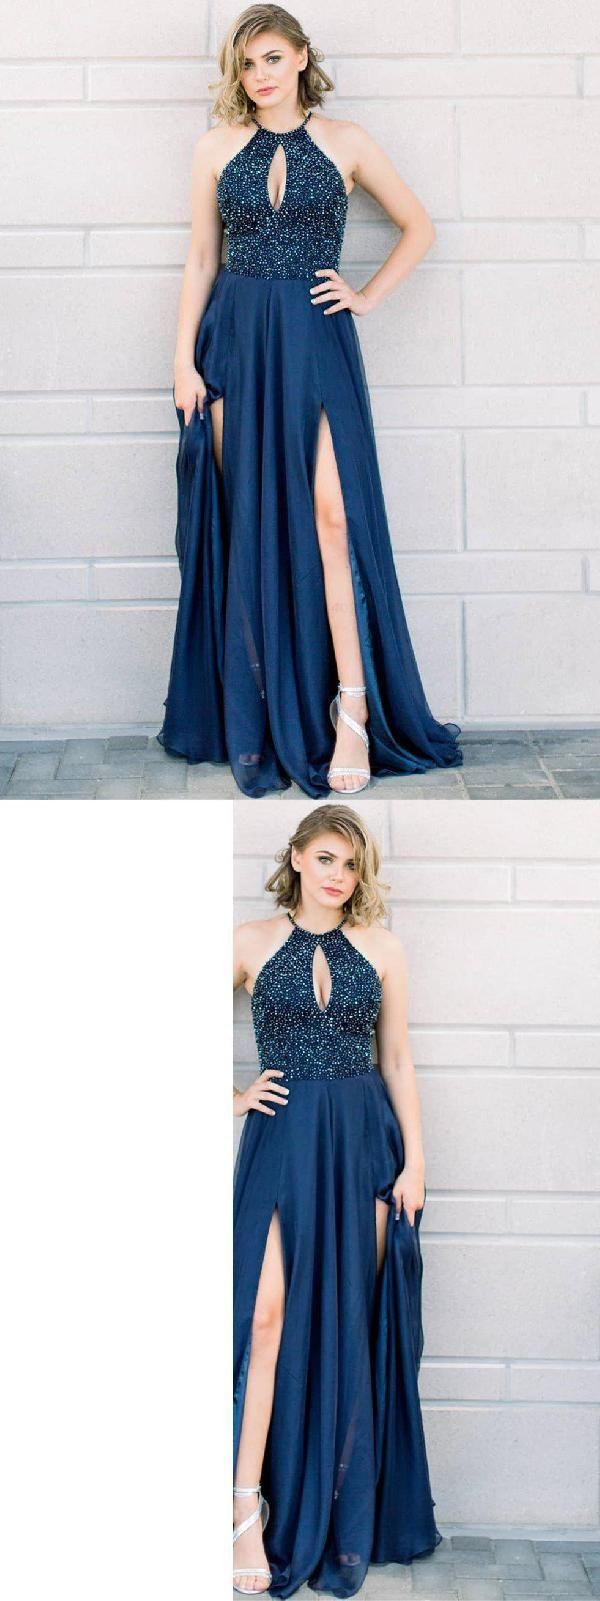 Hot Sale Colorful Prom Dresses A-Line, 2019 Prom Dresses ...